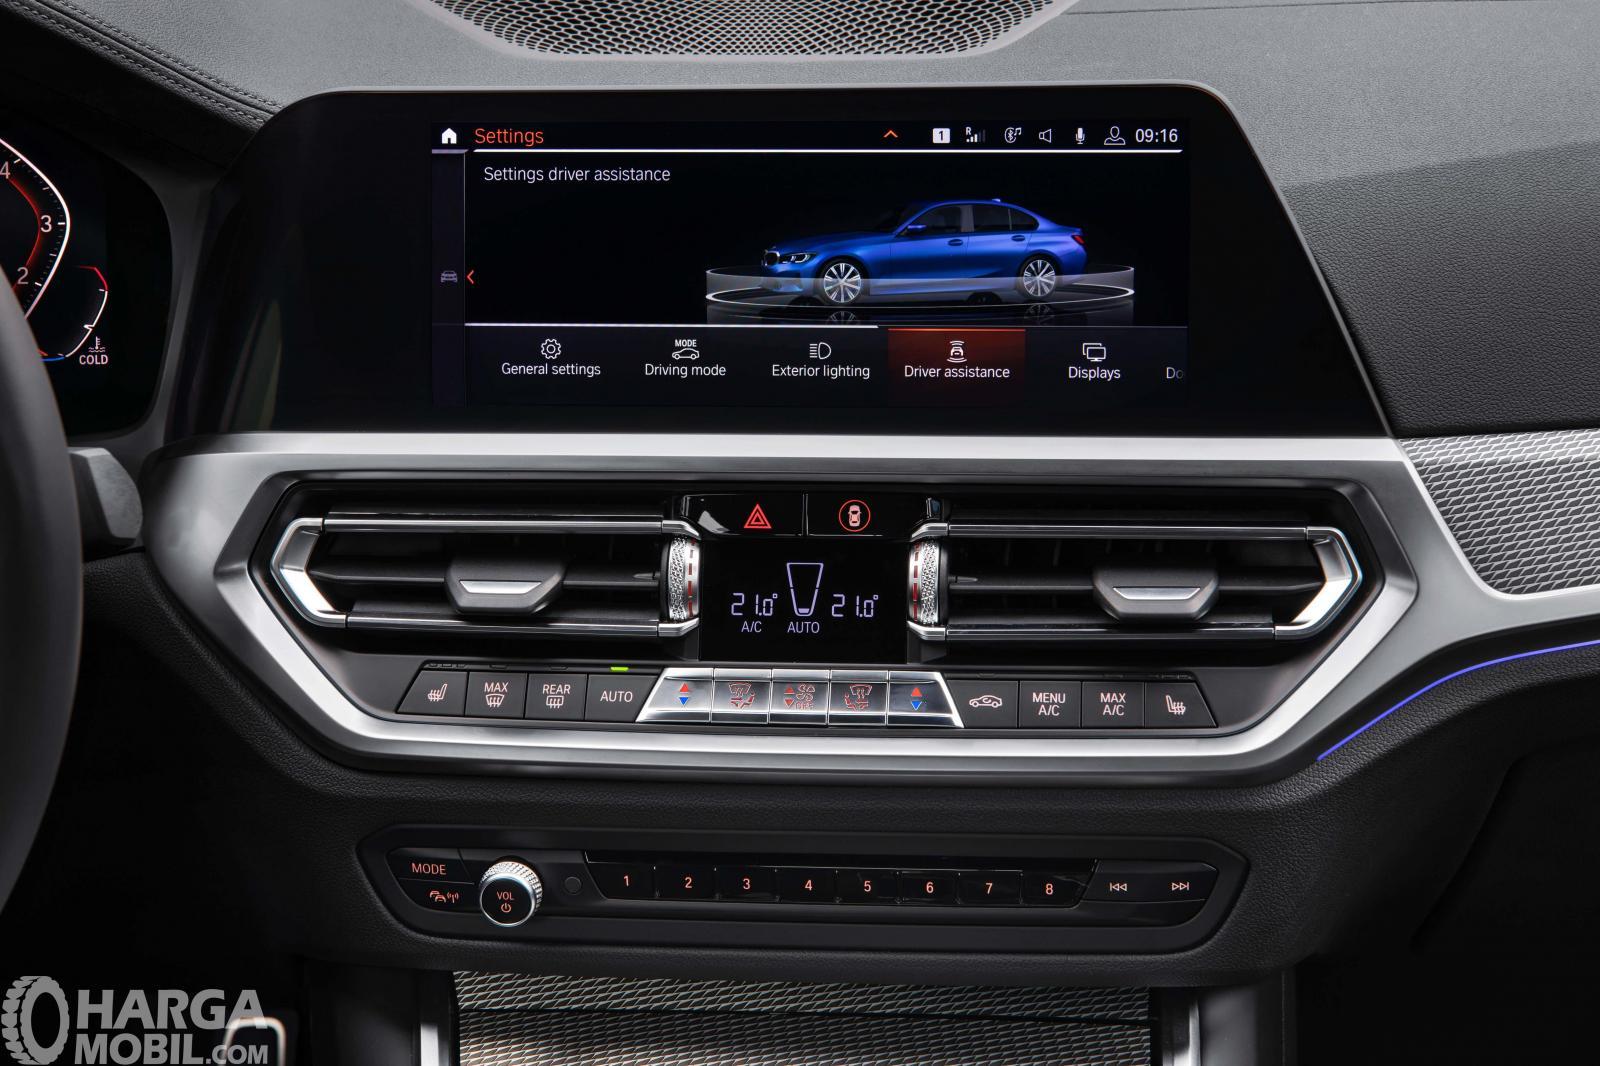 Foto panel BMW 3 Series 2019